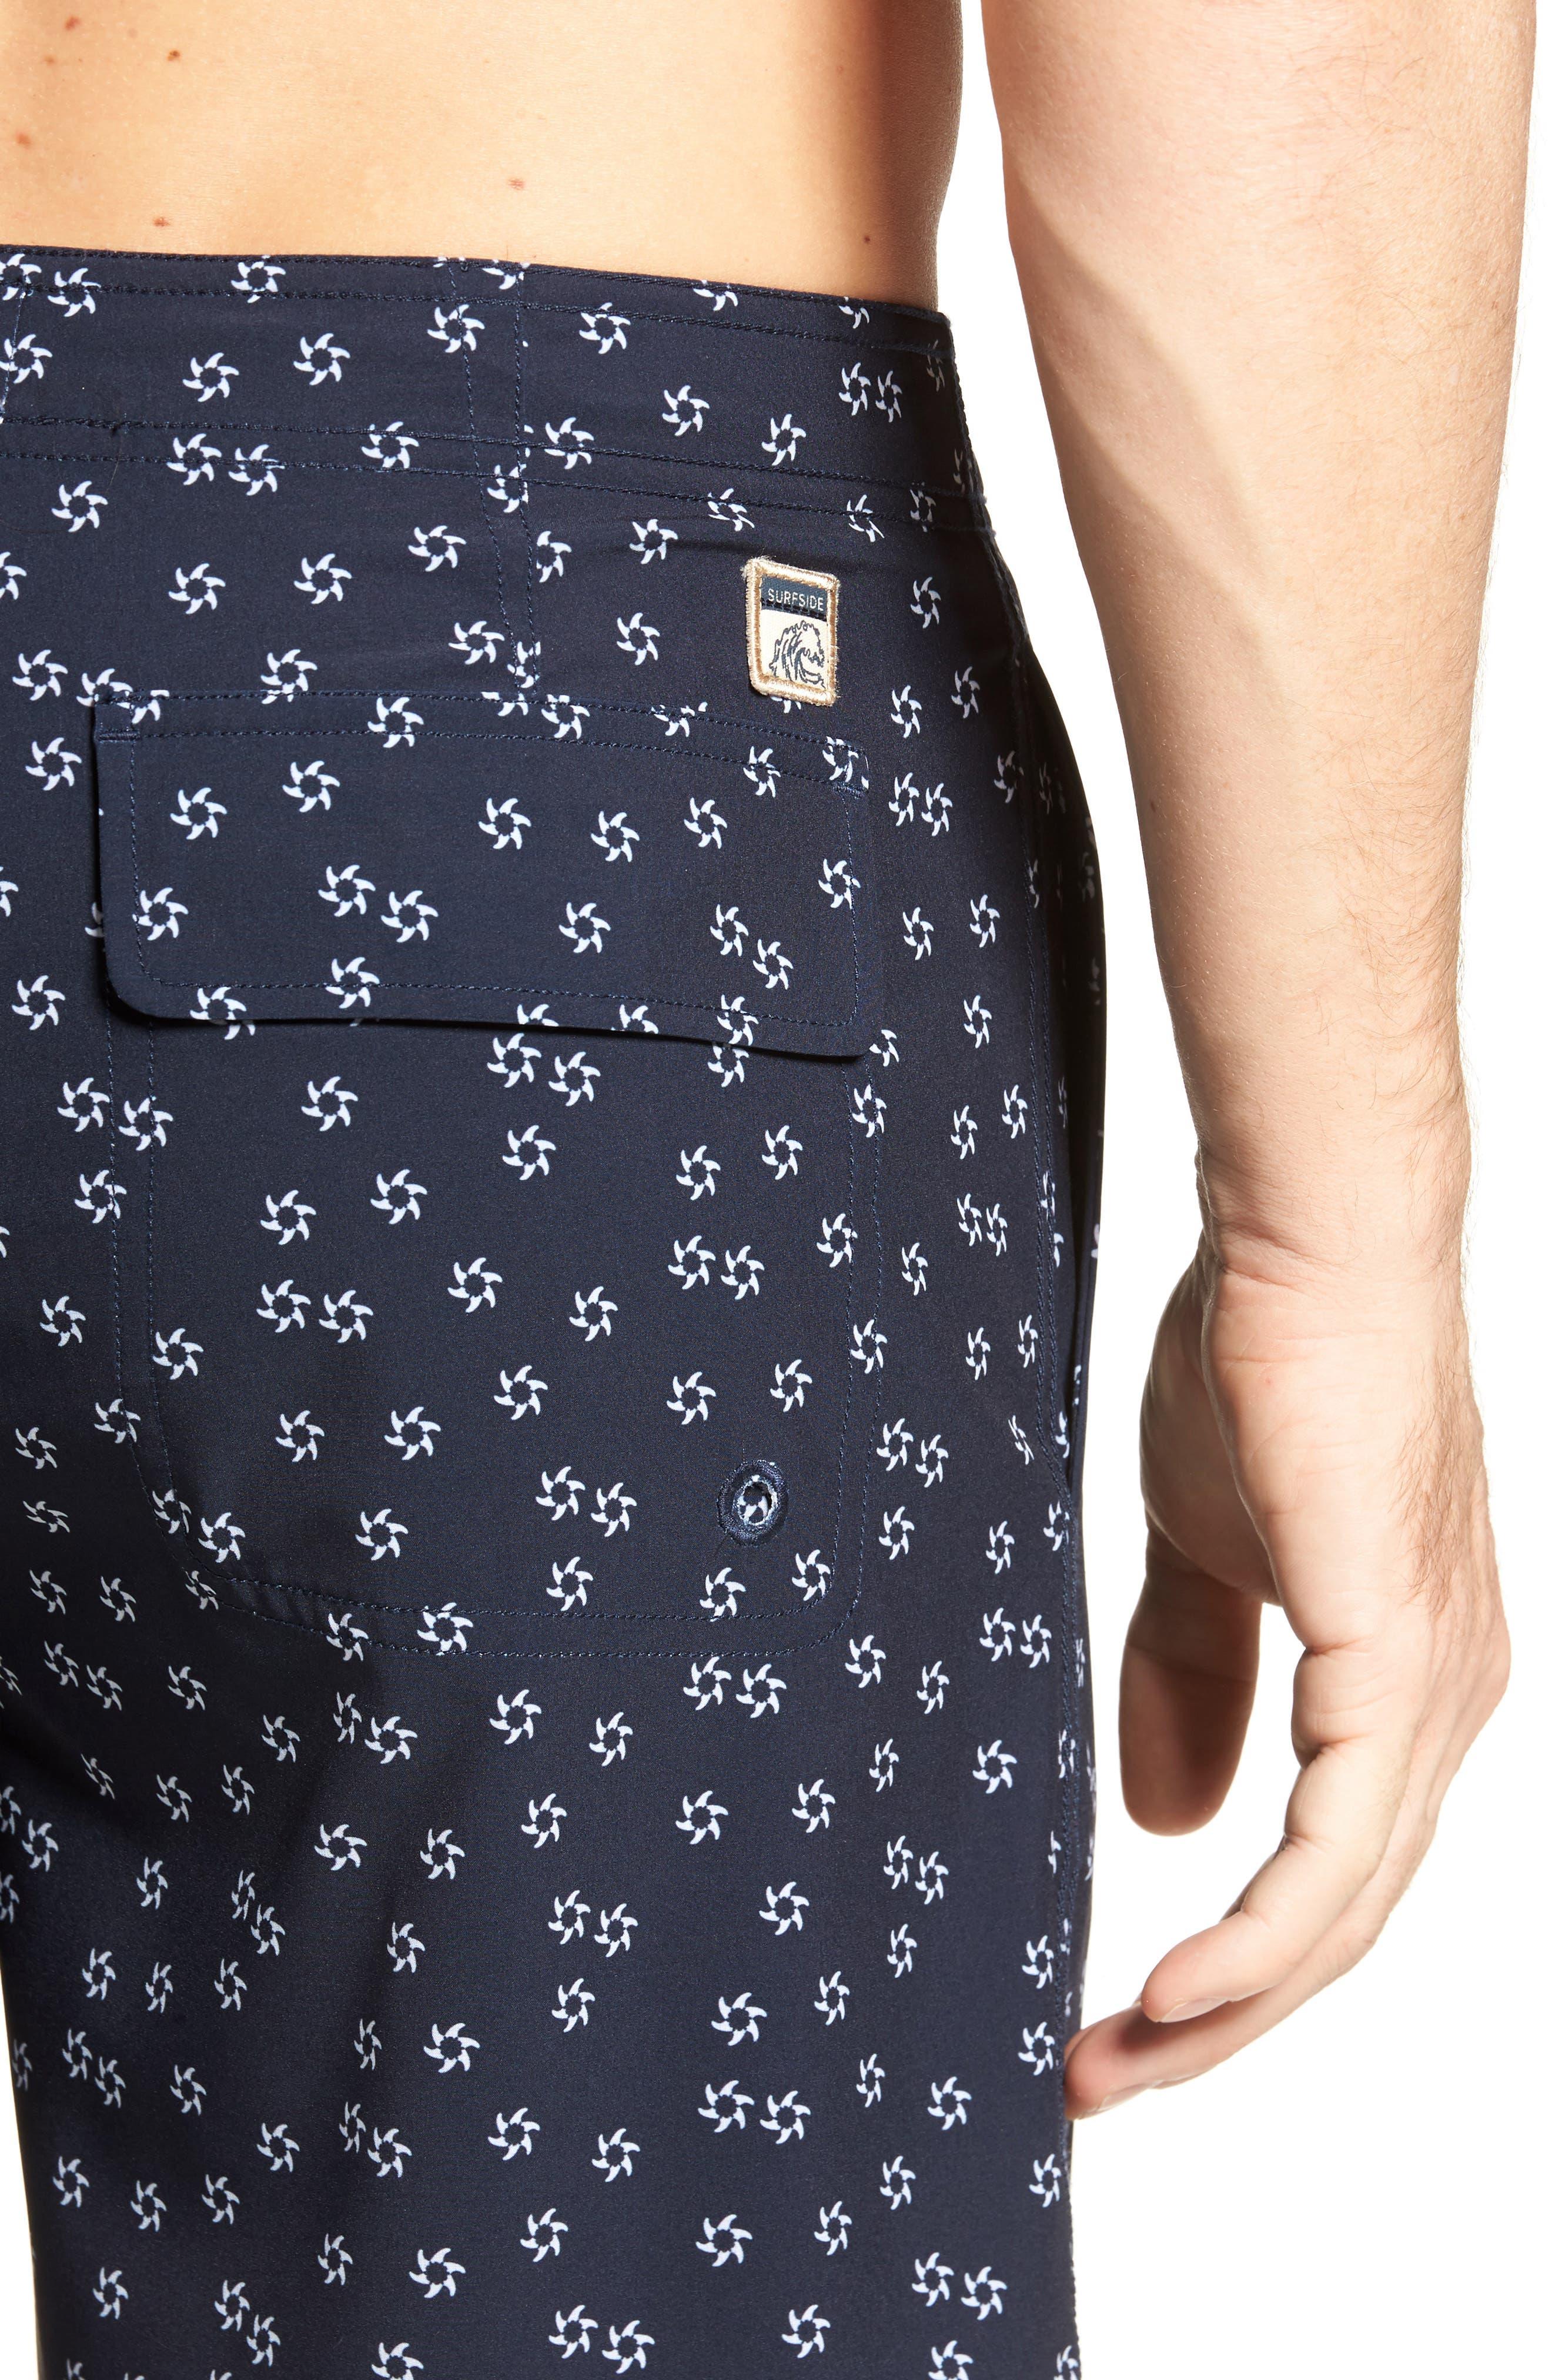 Fin Print Board Shorts,                             Alternate thumbnail 4, color,                             Navy Blazer